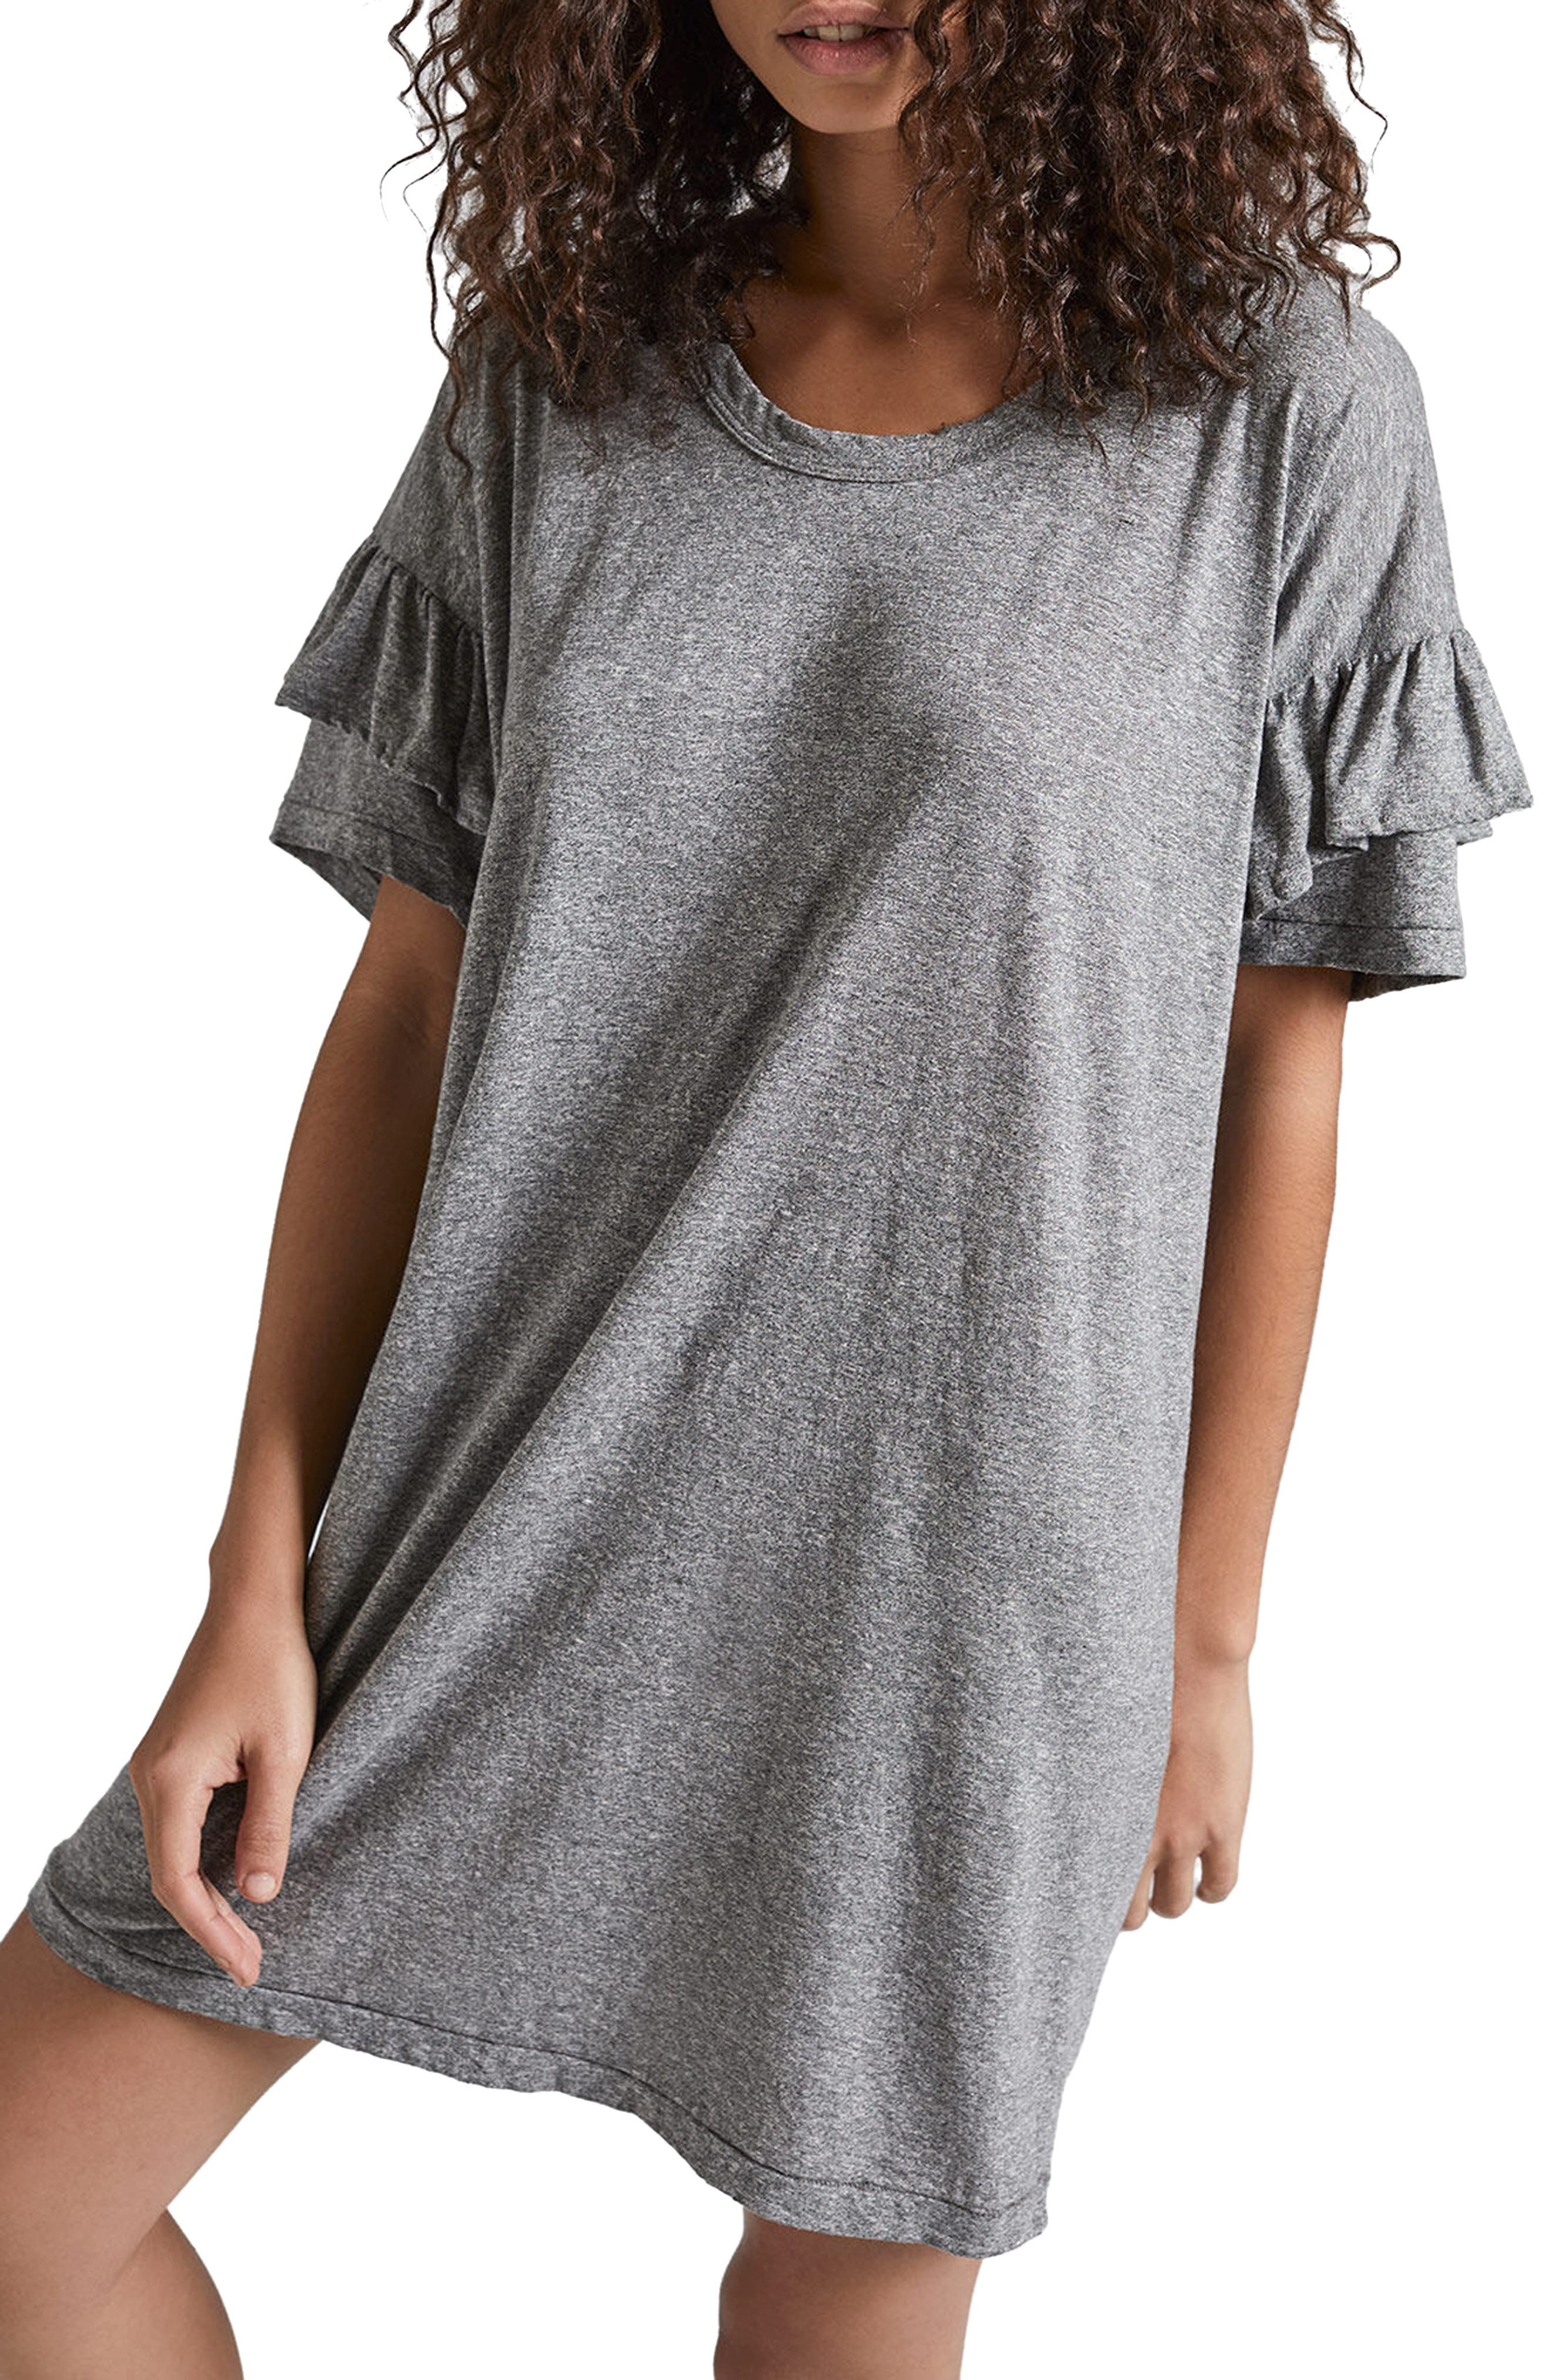 Ruffle Roadie T-Shirt Dress,                             Main thumbnail 1, color,                             099